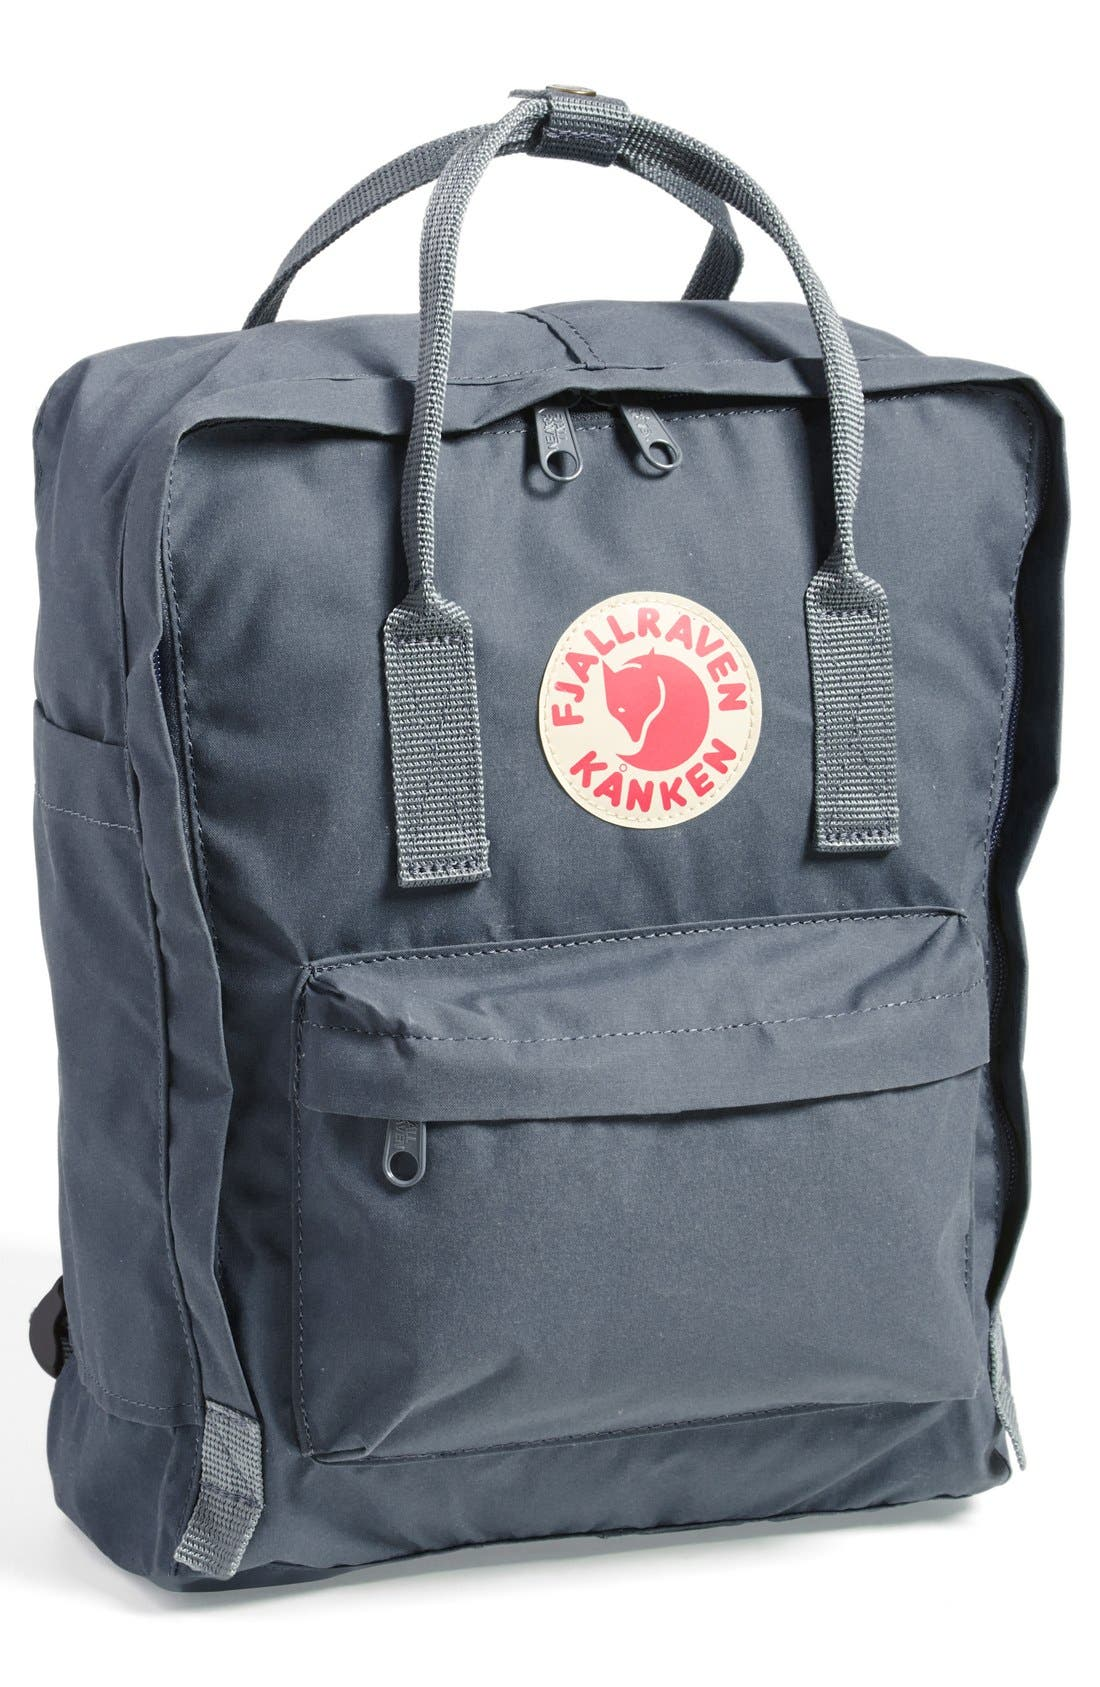 'Kånken' Water Resistant Backpack,                             Main thumbnail 1, color,                             GRAPHITE